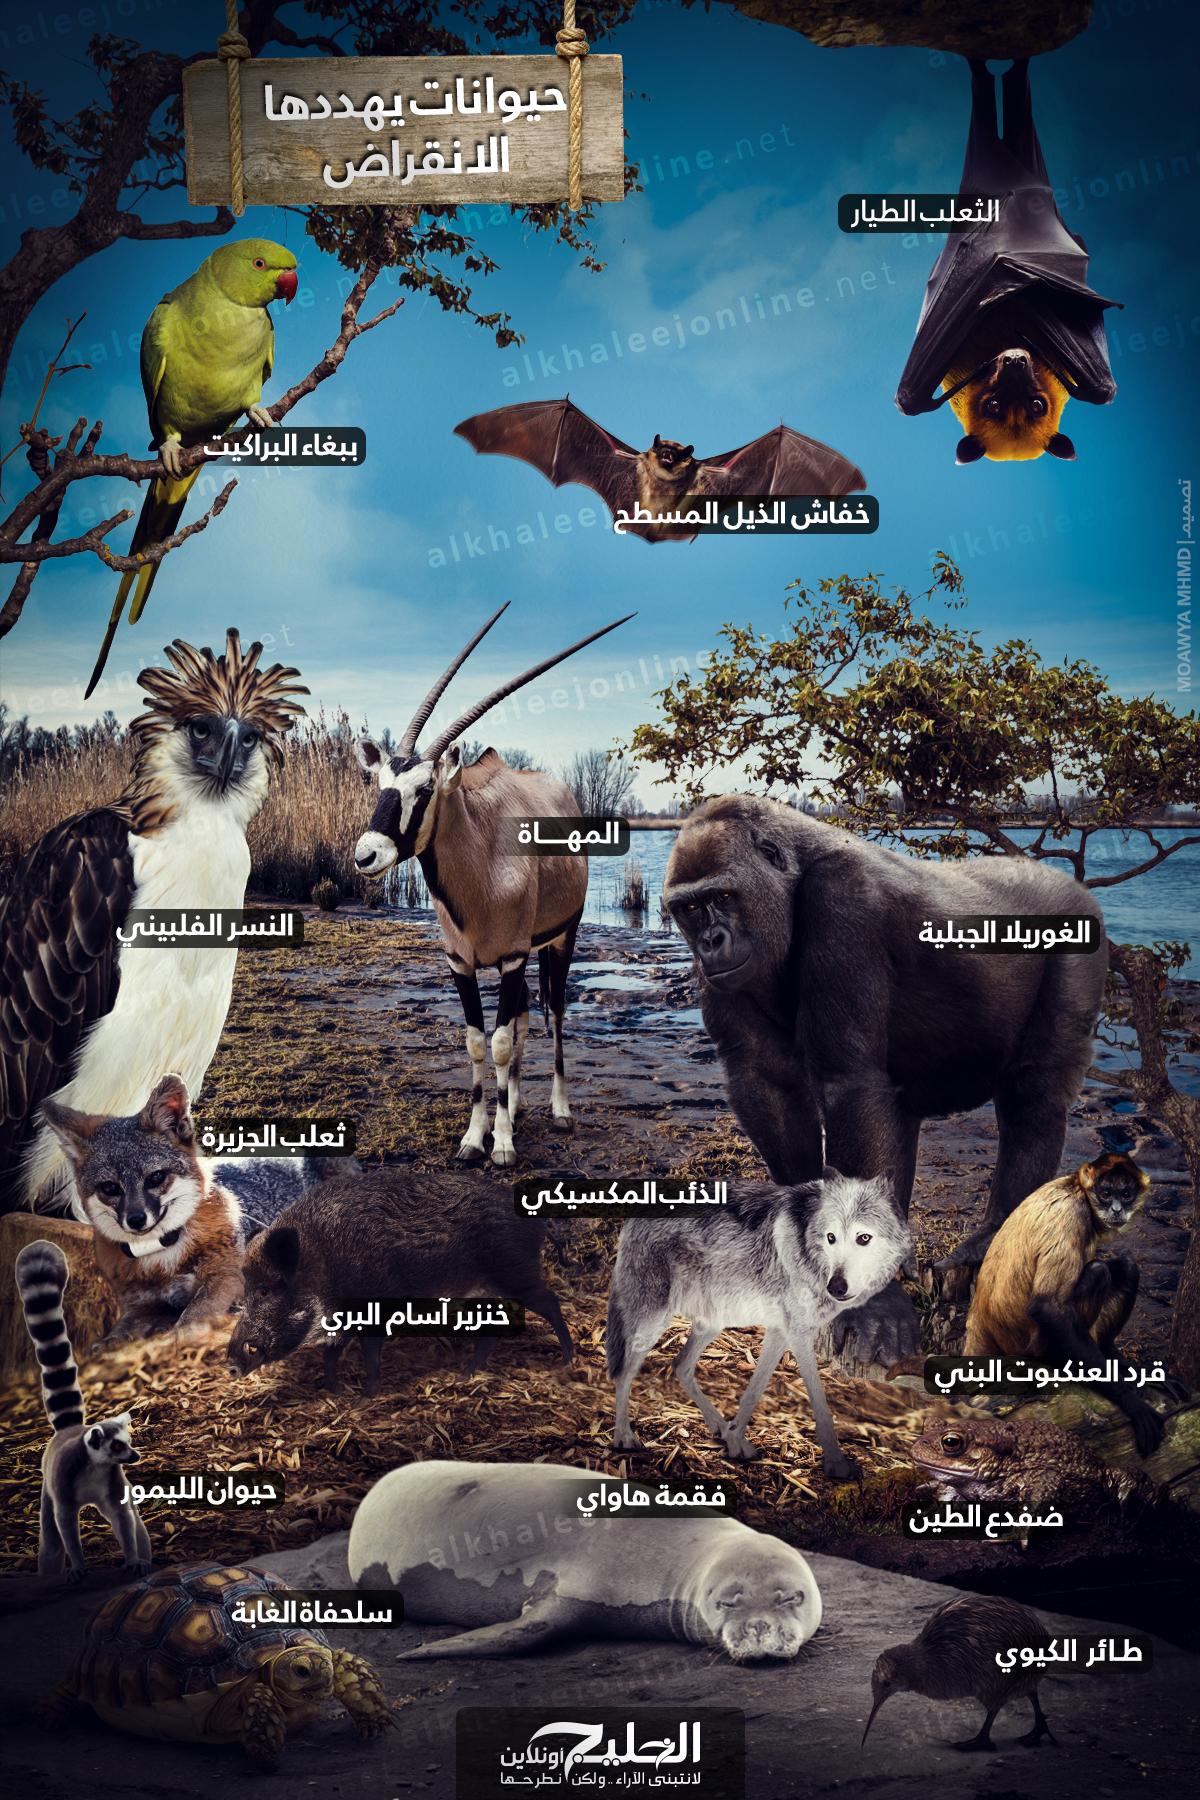 حيوانات-يهددها-الانقراض